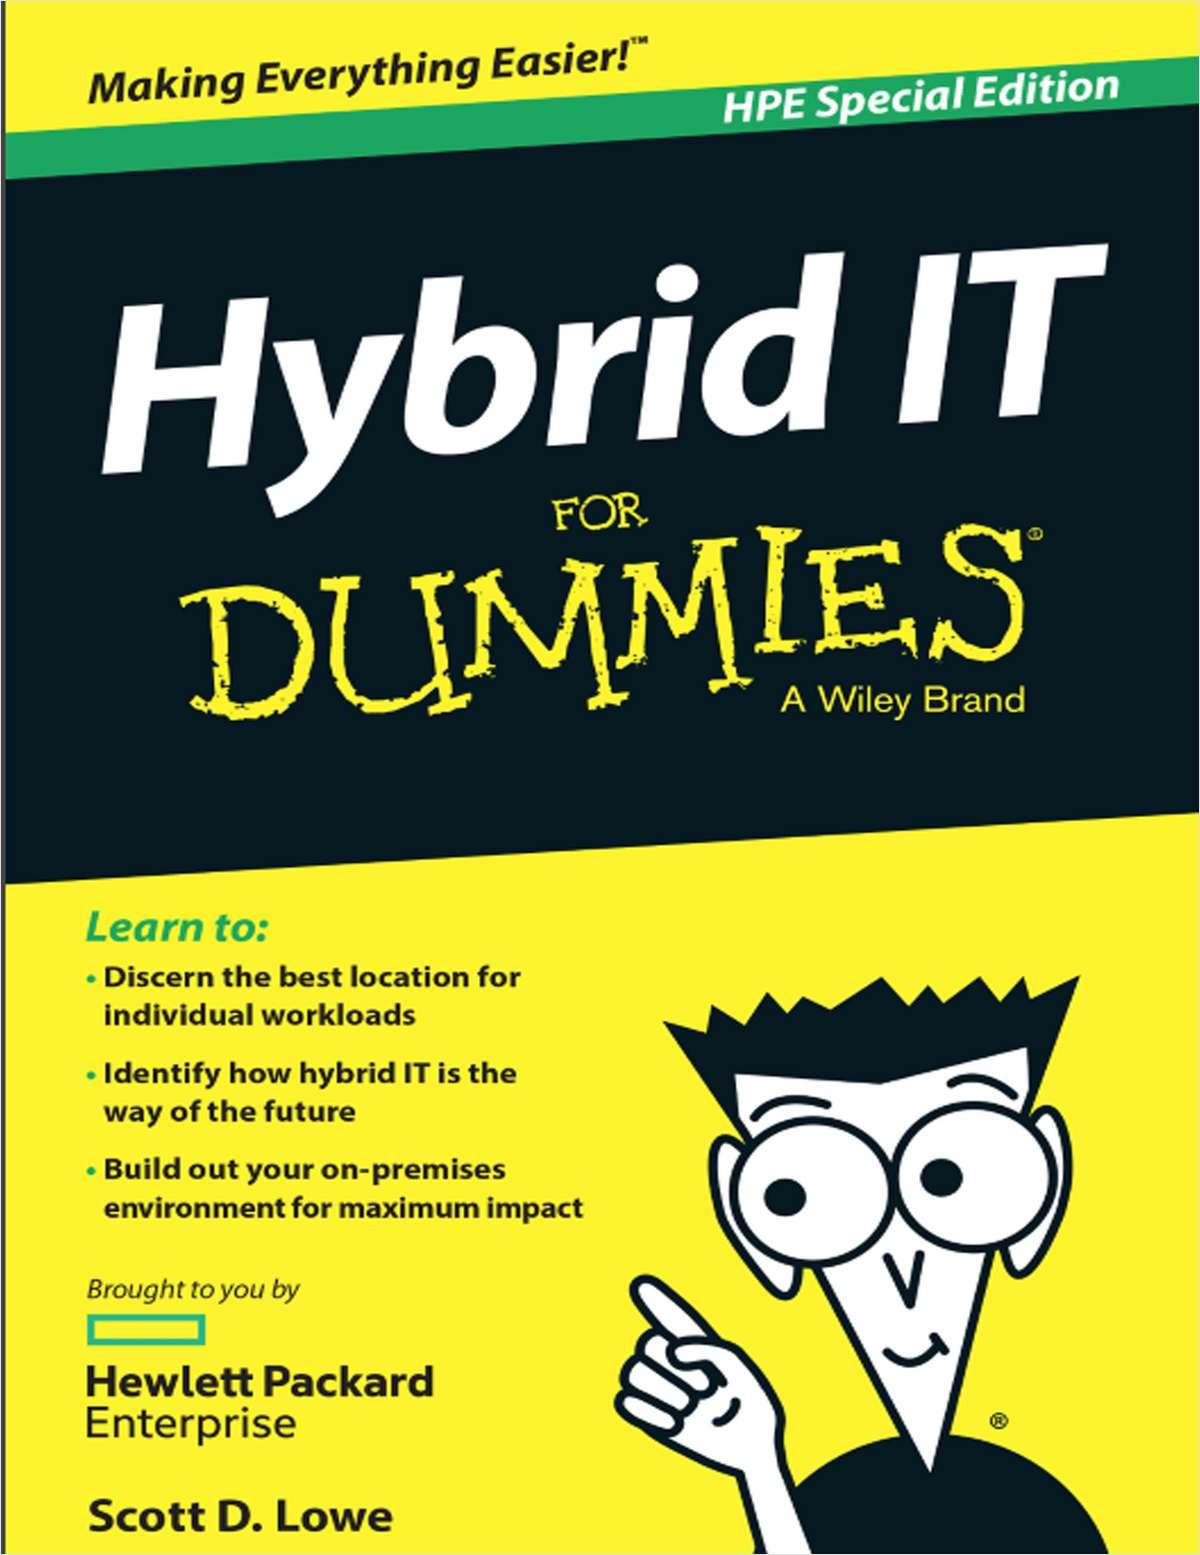 Hybrid IT for Dummies